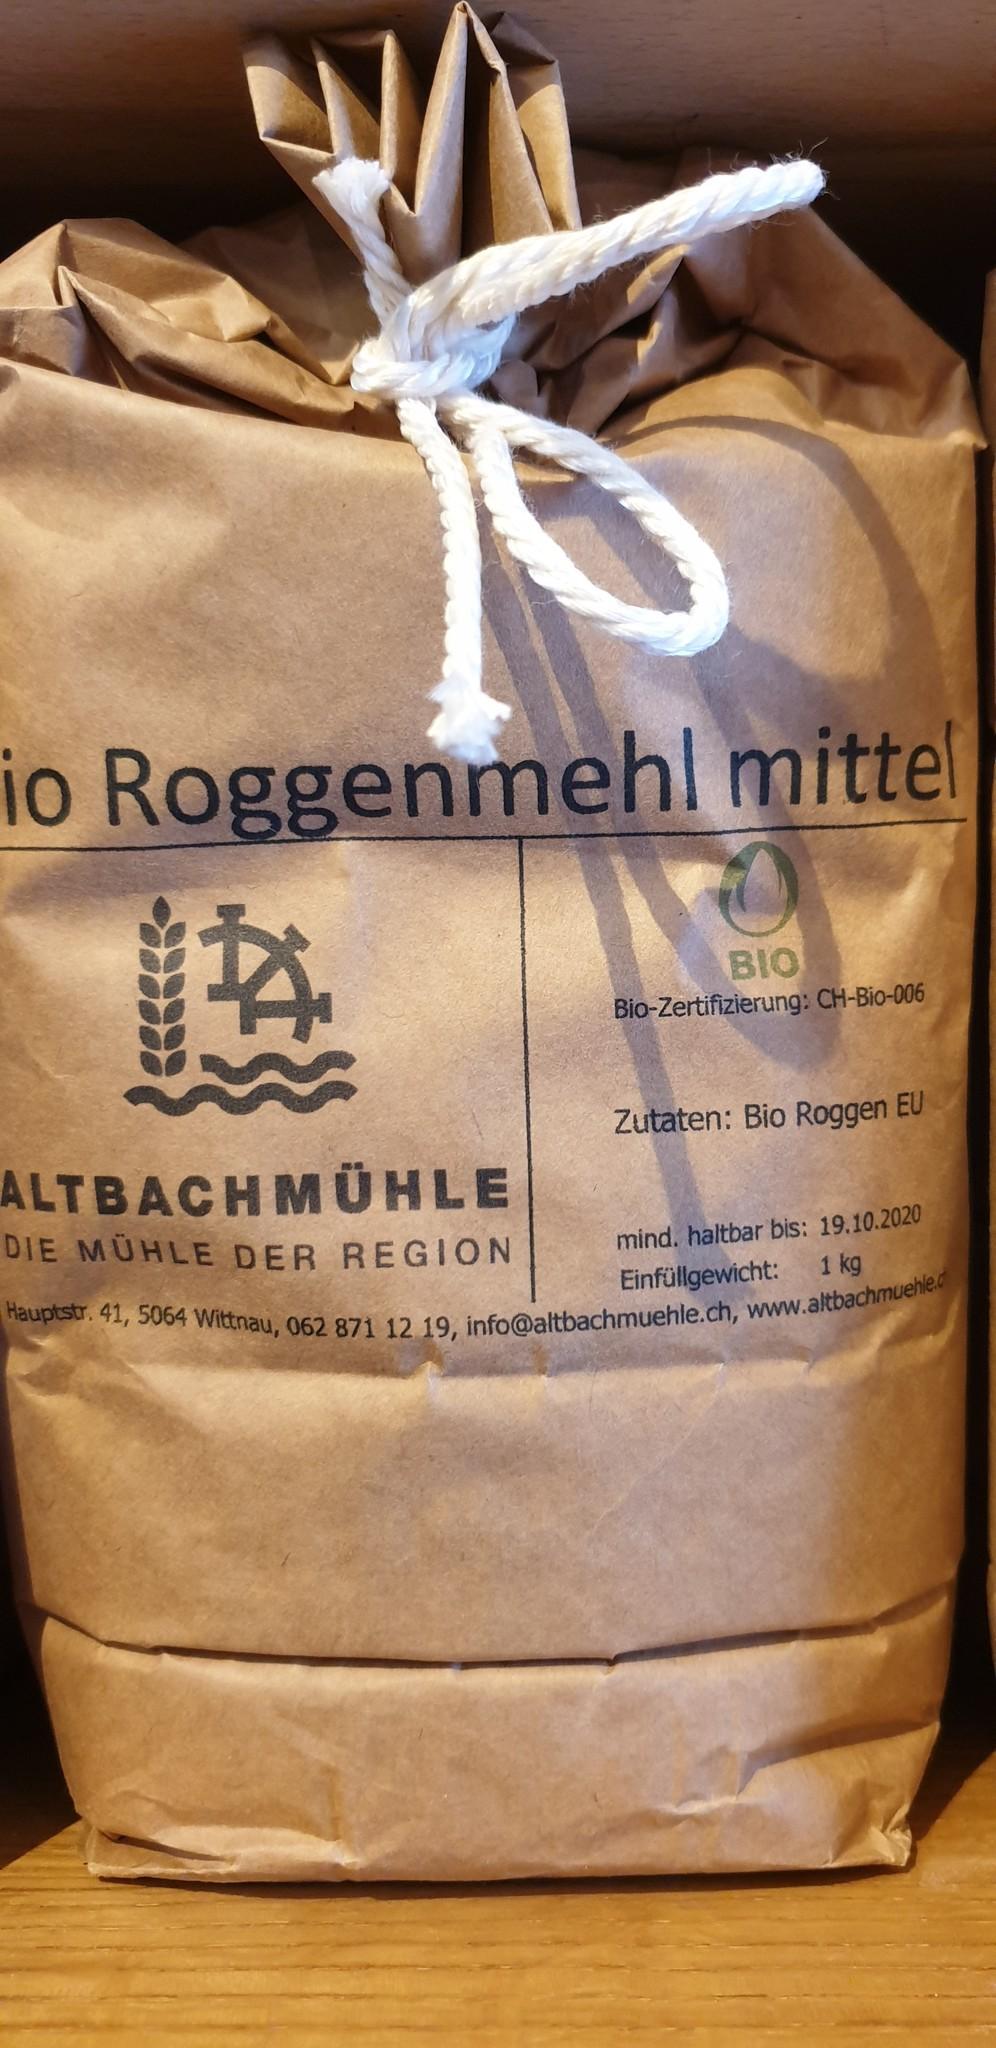 Altbachmühle Roggenmehl mittel bio 1kg Altbachmühle